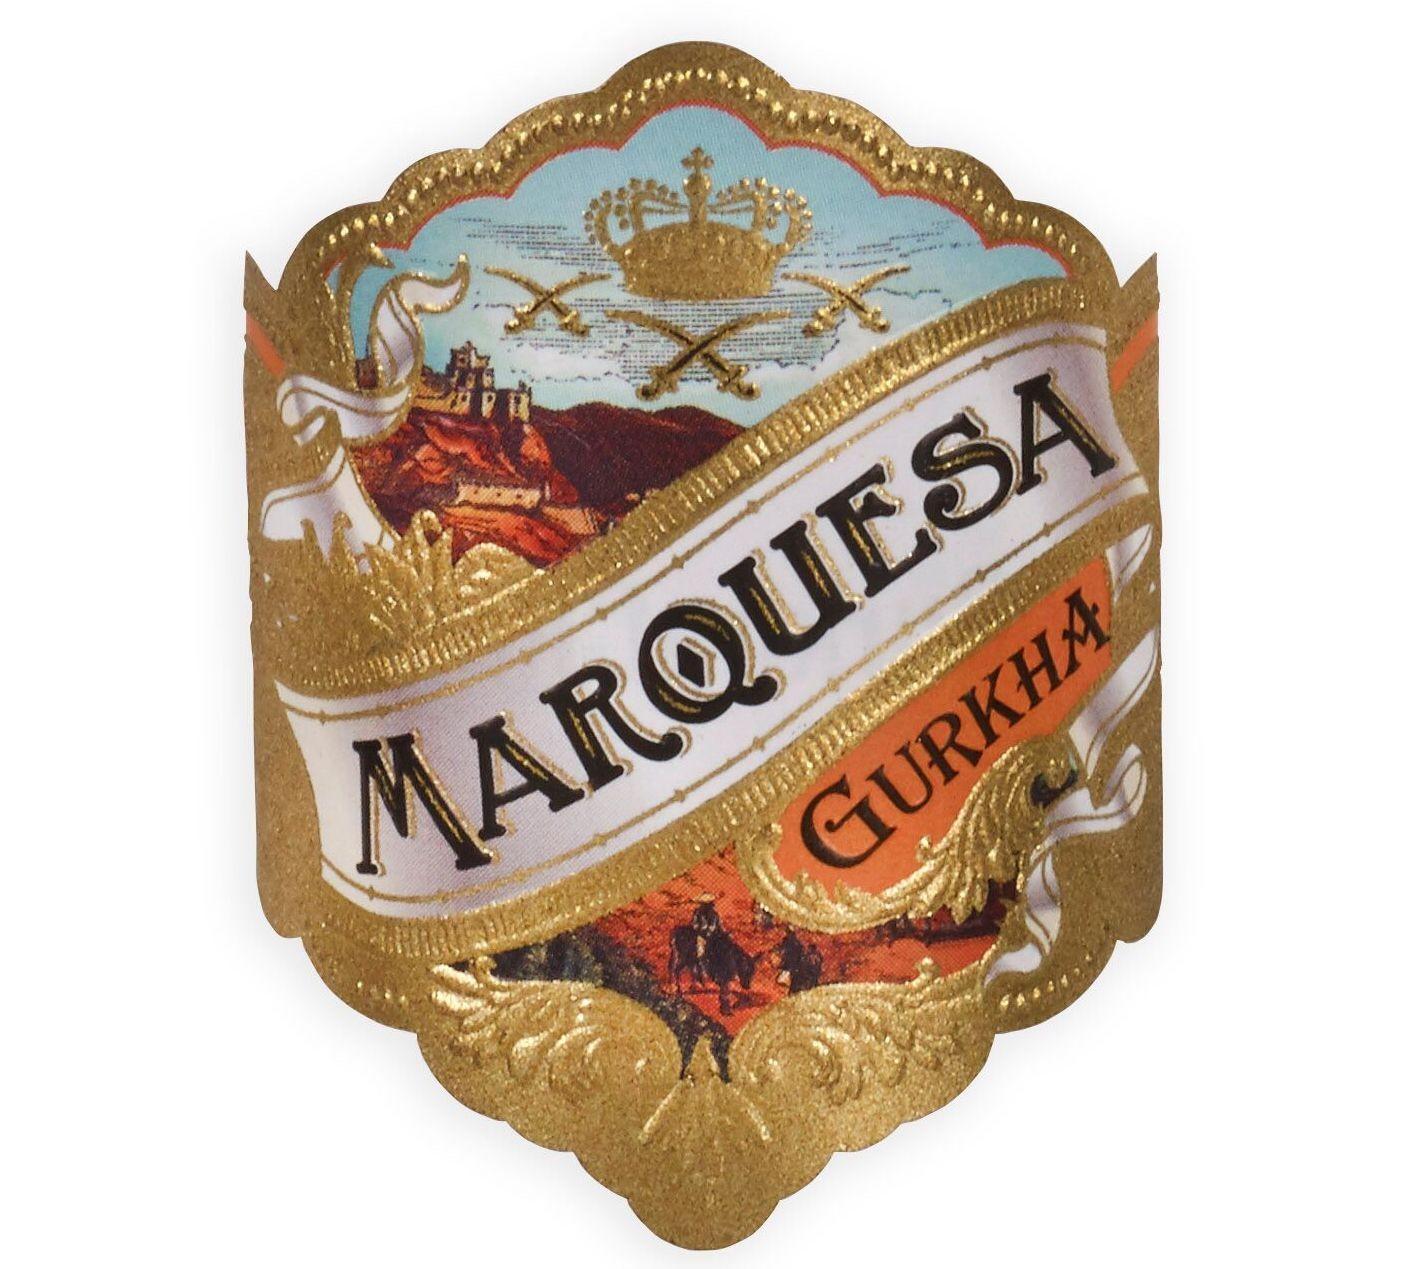 Little Havana Cigar Factory - Gurkha Marquesa Toro Cigars